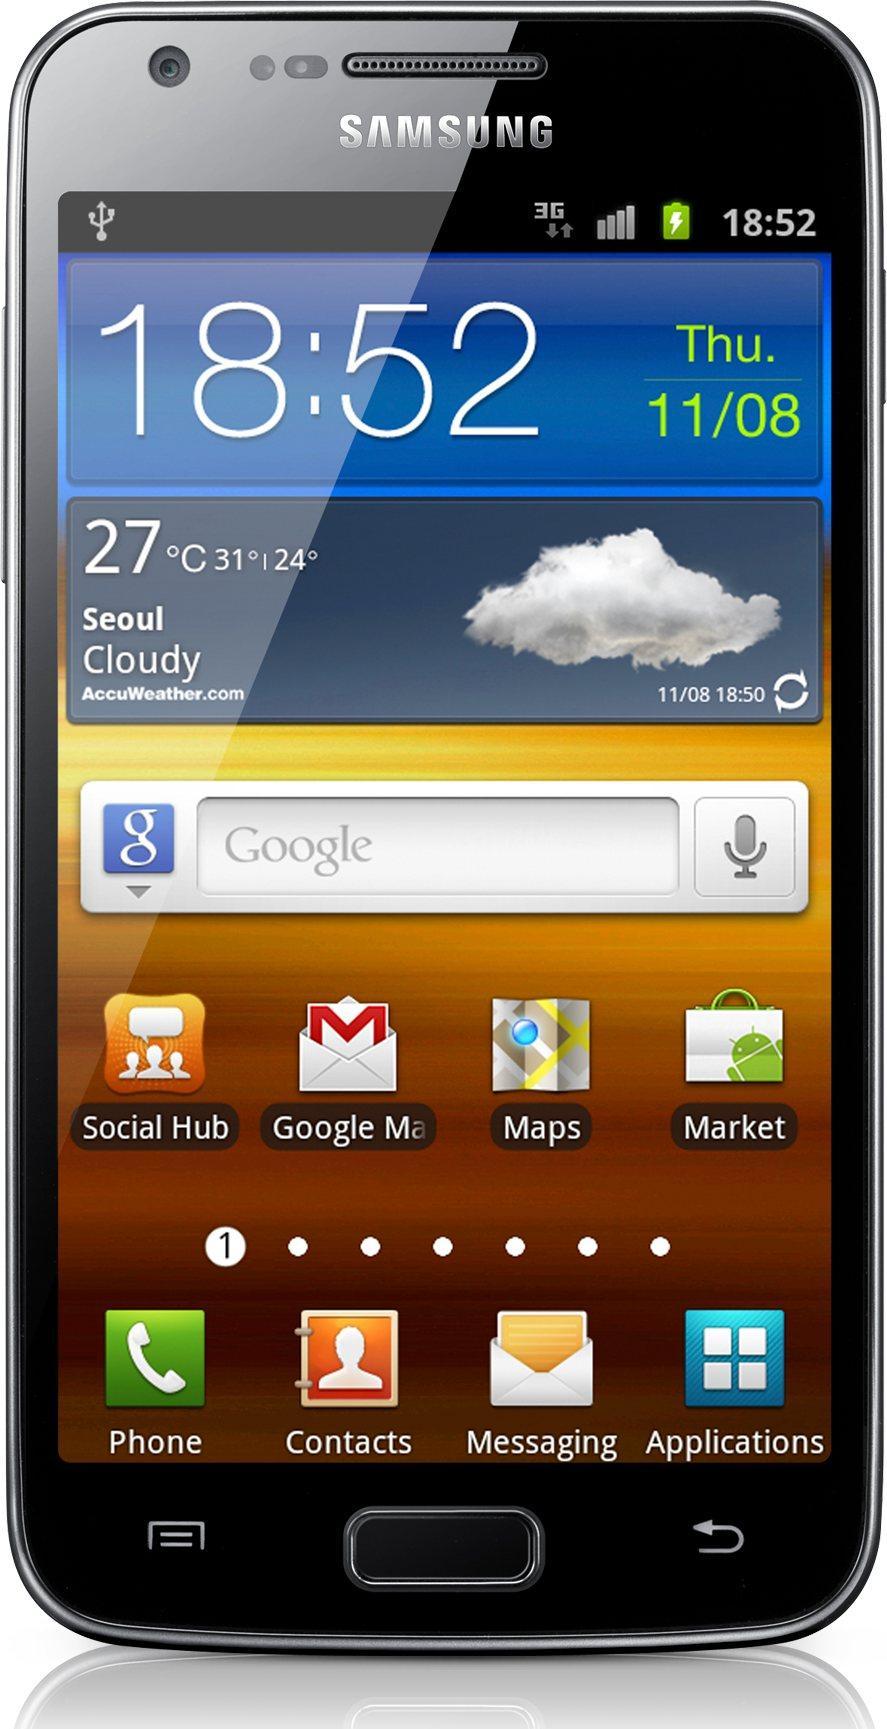 Galaxy S 2 LTE GT-I9210